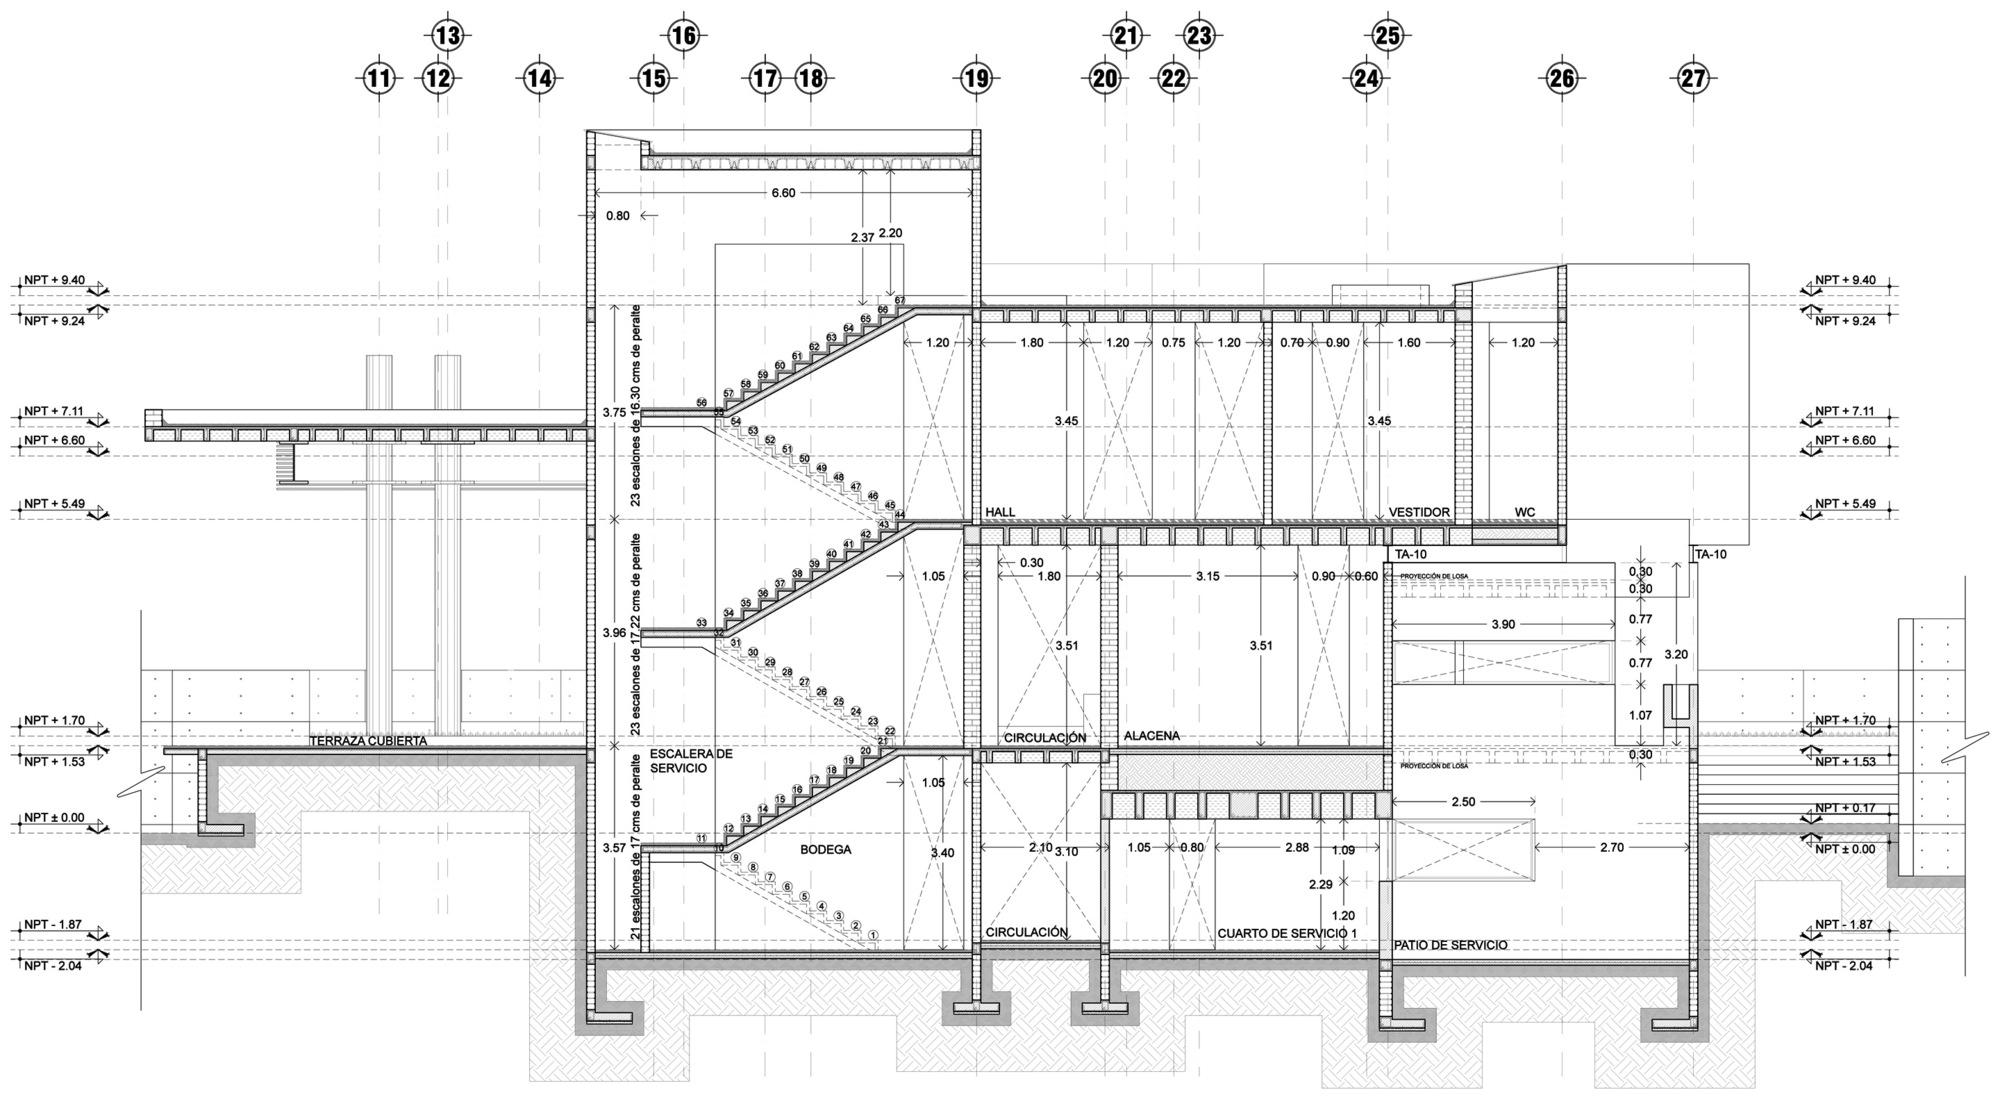 Galer a de casa jerbana reims arquitectura 58 for Tipos de escaleras arquitectura